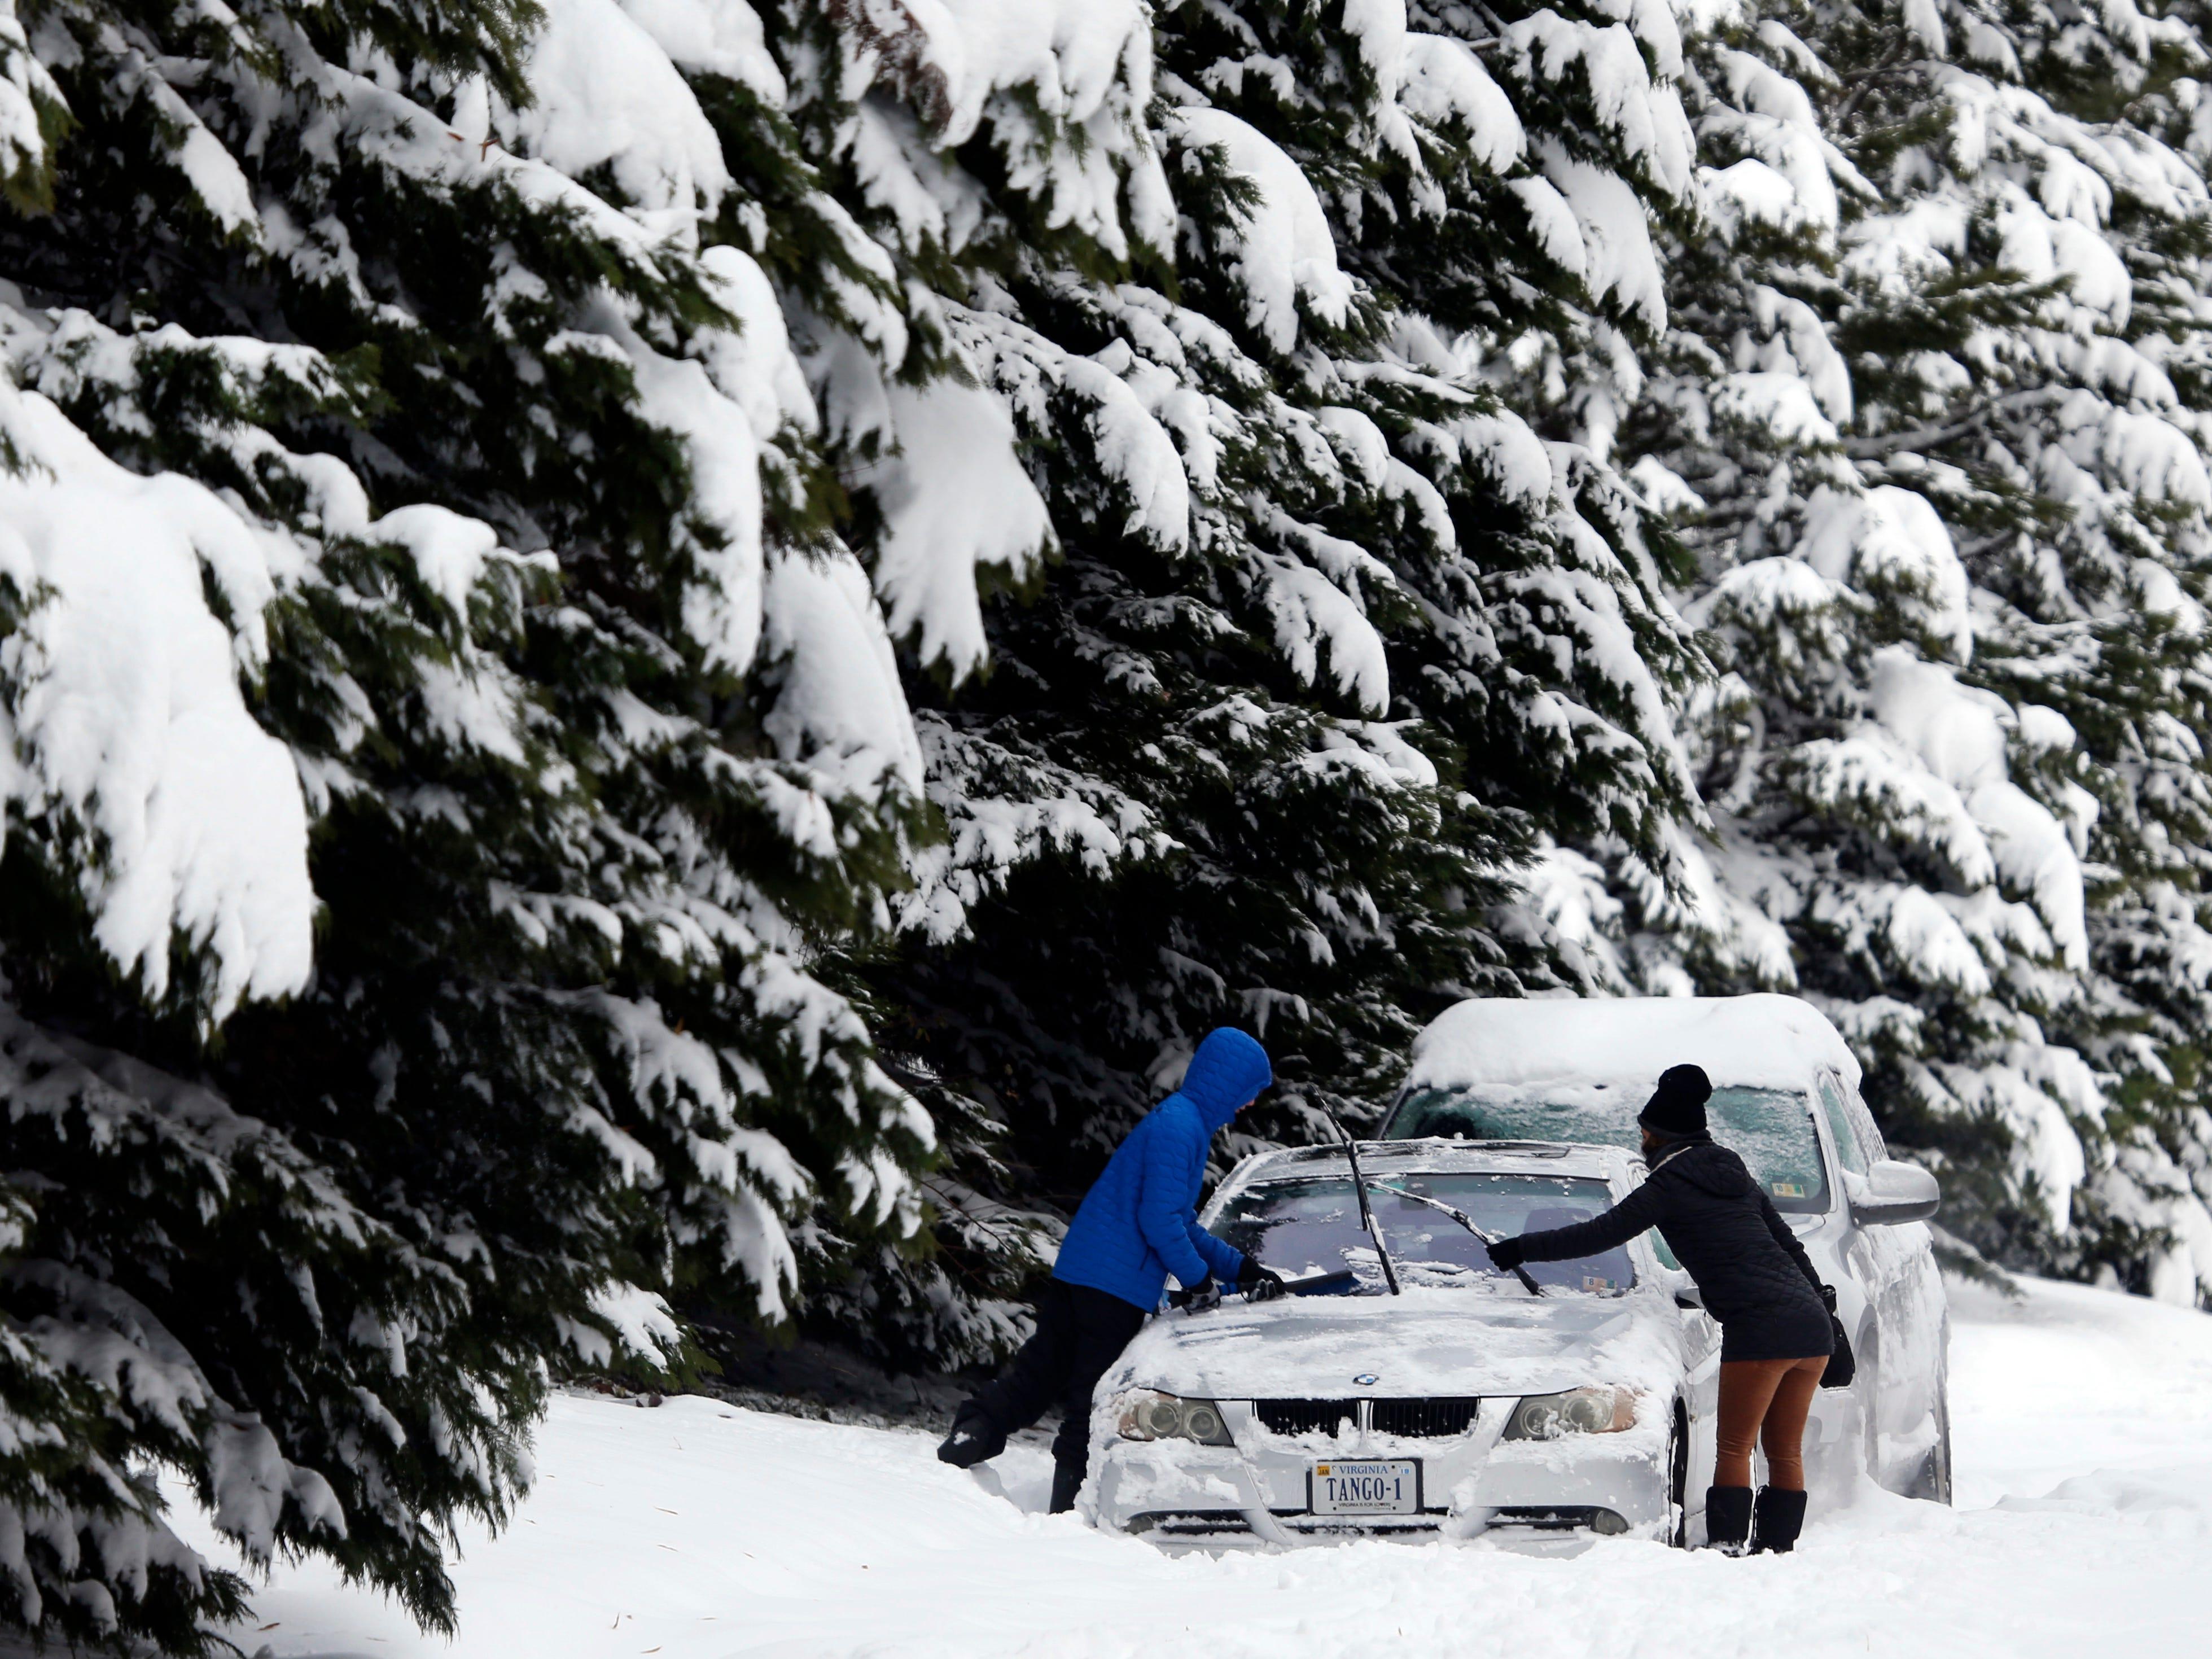 A motorist cleans snow off cars in Richmond, Va., Monday, Dec. 10, 2018.